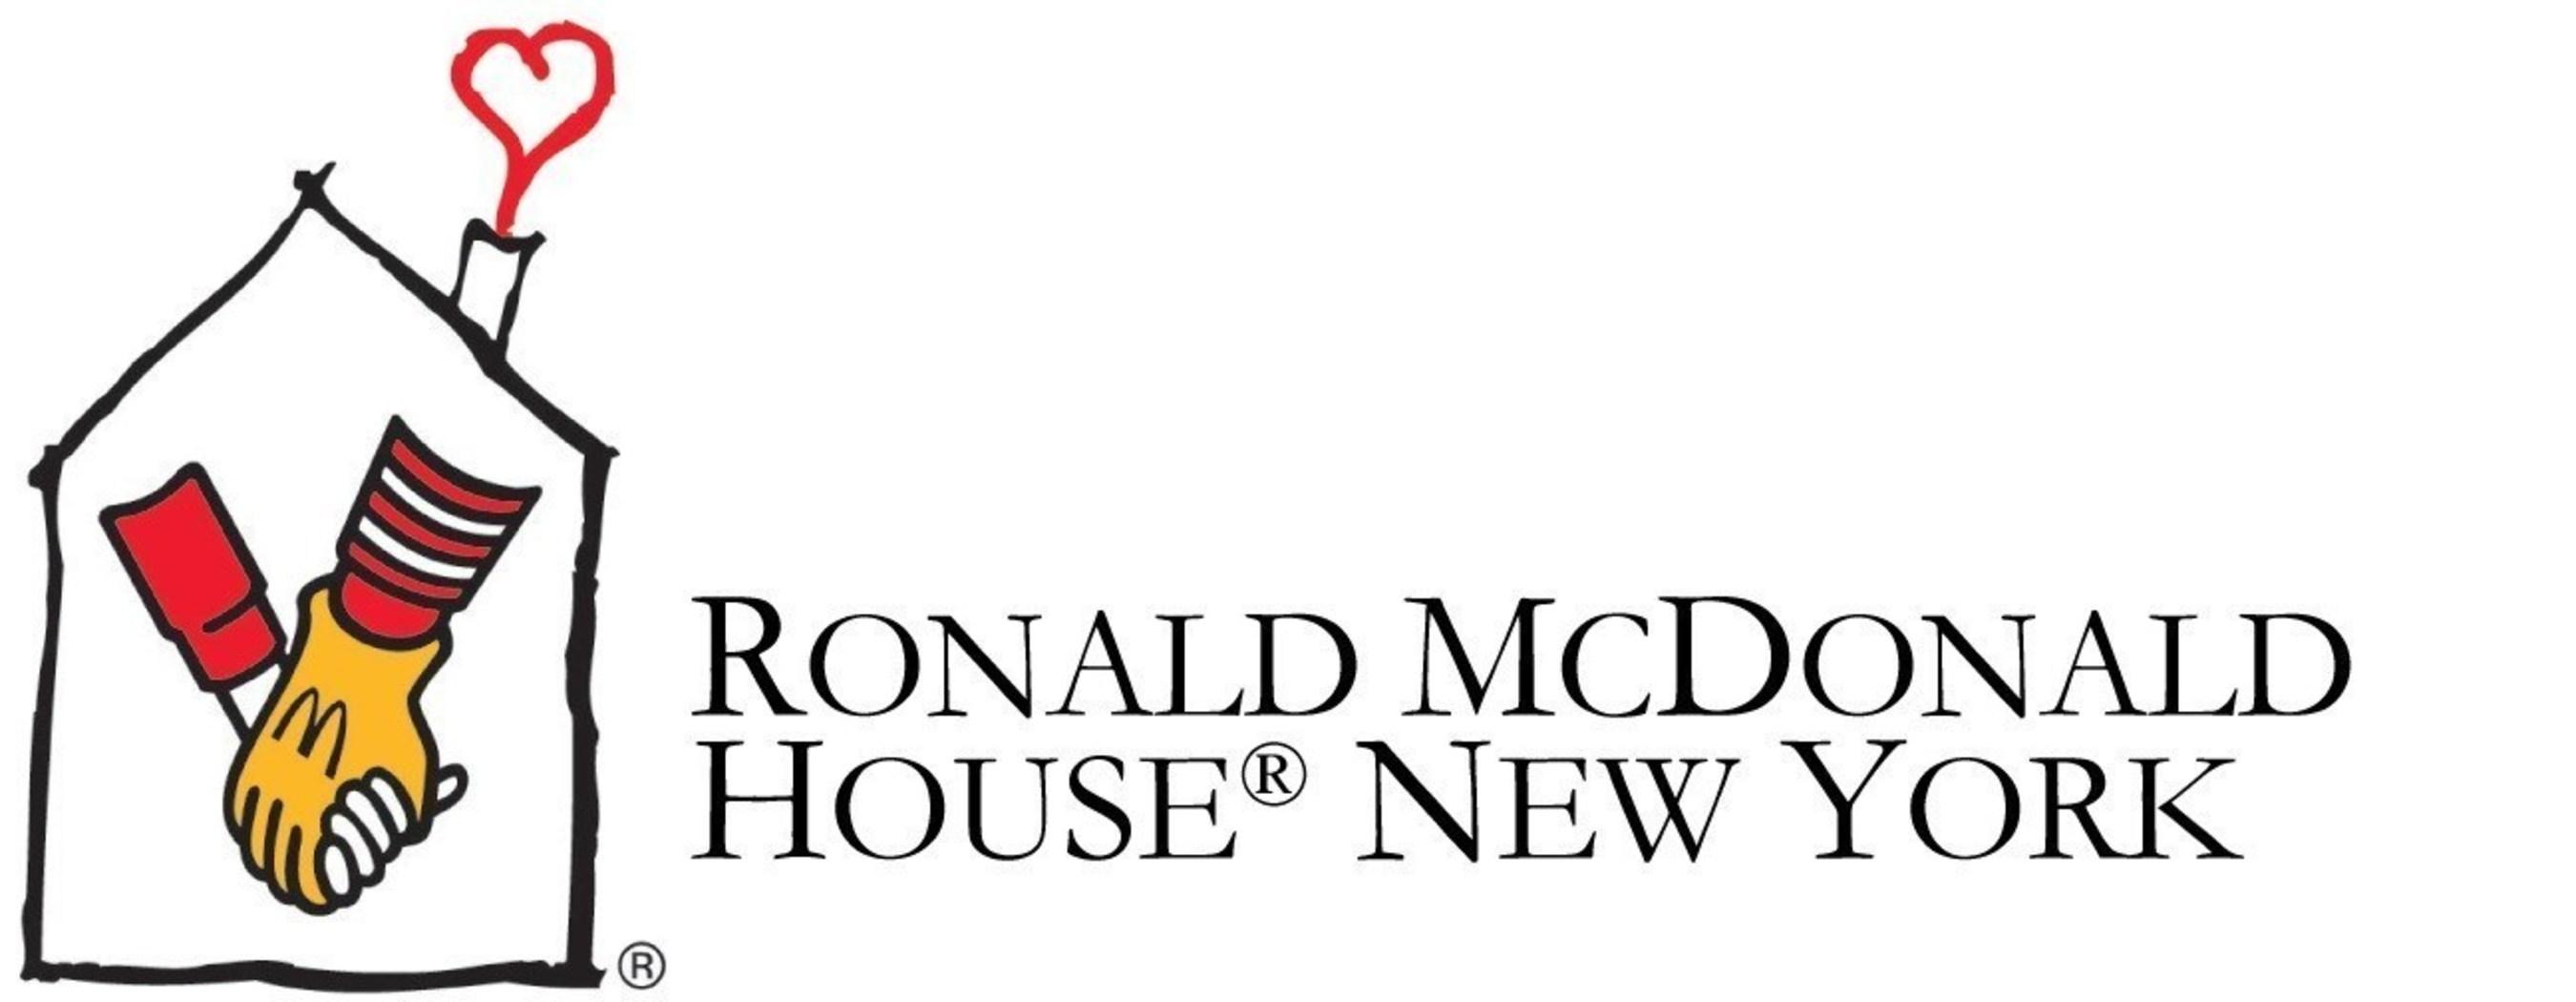 Ronald McDonald House - New York